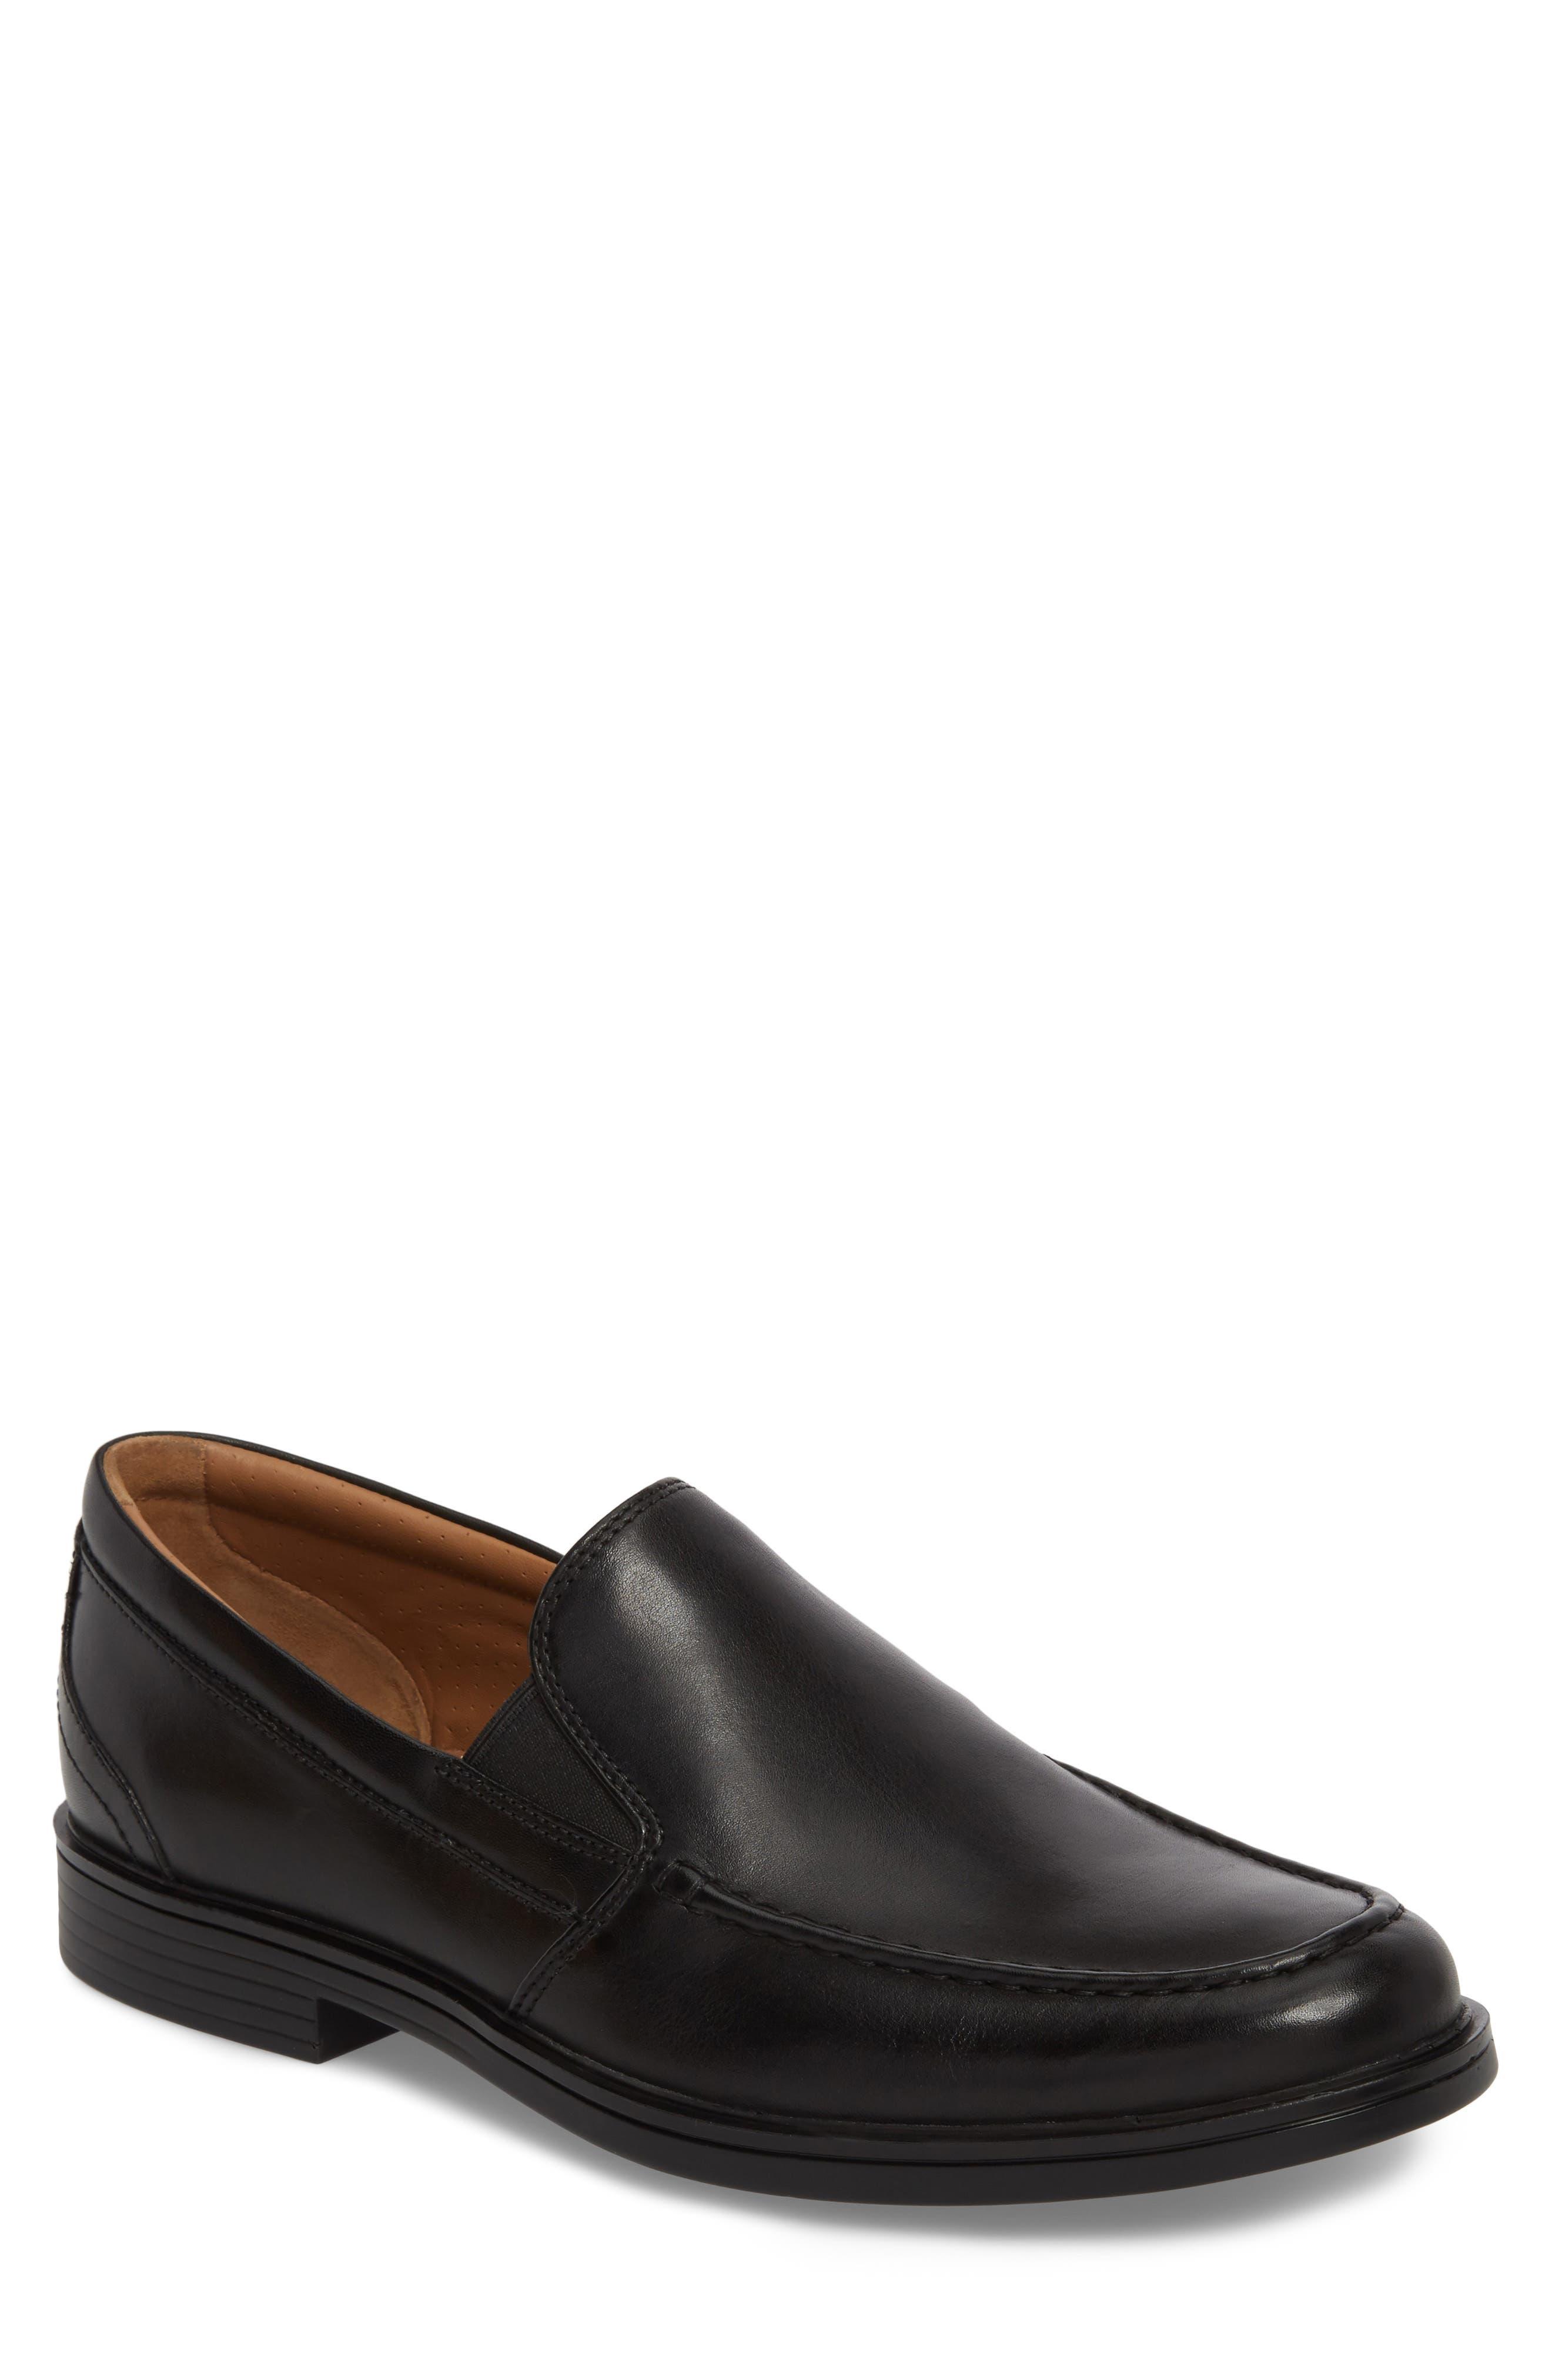 Unaldric Apron Toe Loafer,                             Main thumbnail 1, color,                             Black Leather